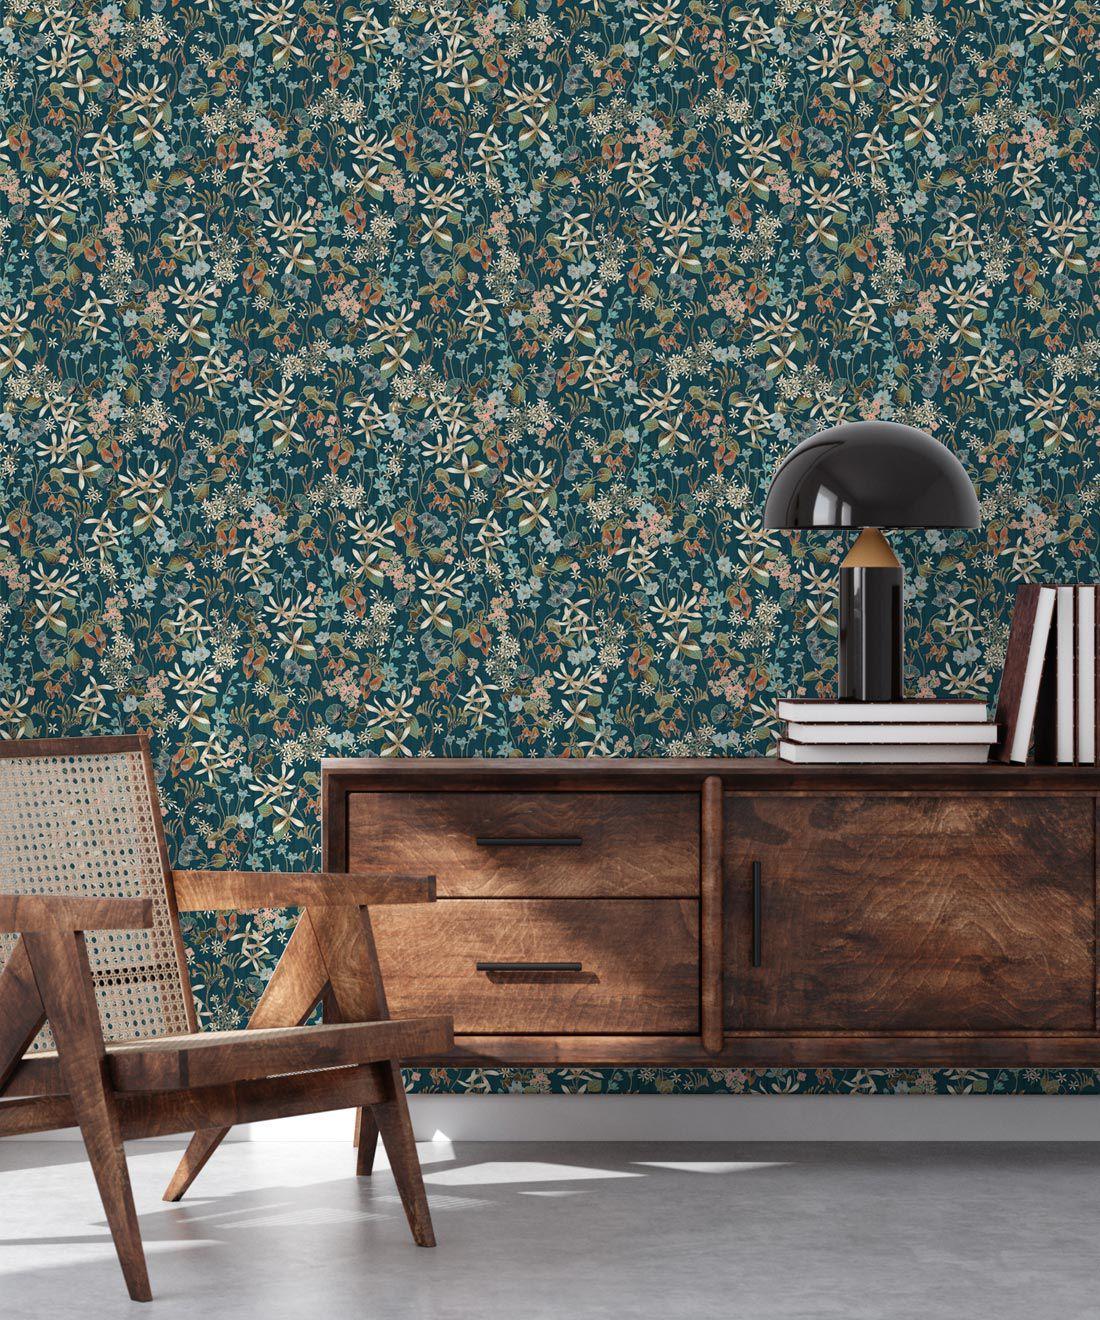 County Flowers Wallpaper • Eloise Short • Vintage Floral Wallpaper •Granny Chic Wallpaper • Grandmillennial Style Wallpaper •Peacock •Insitu